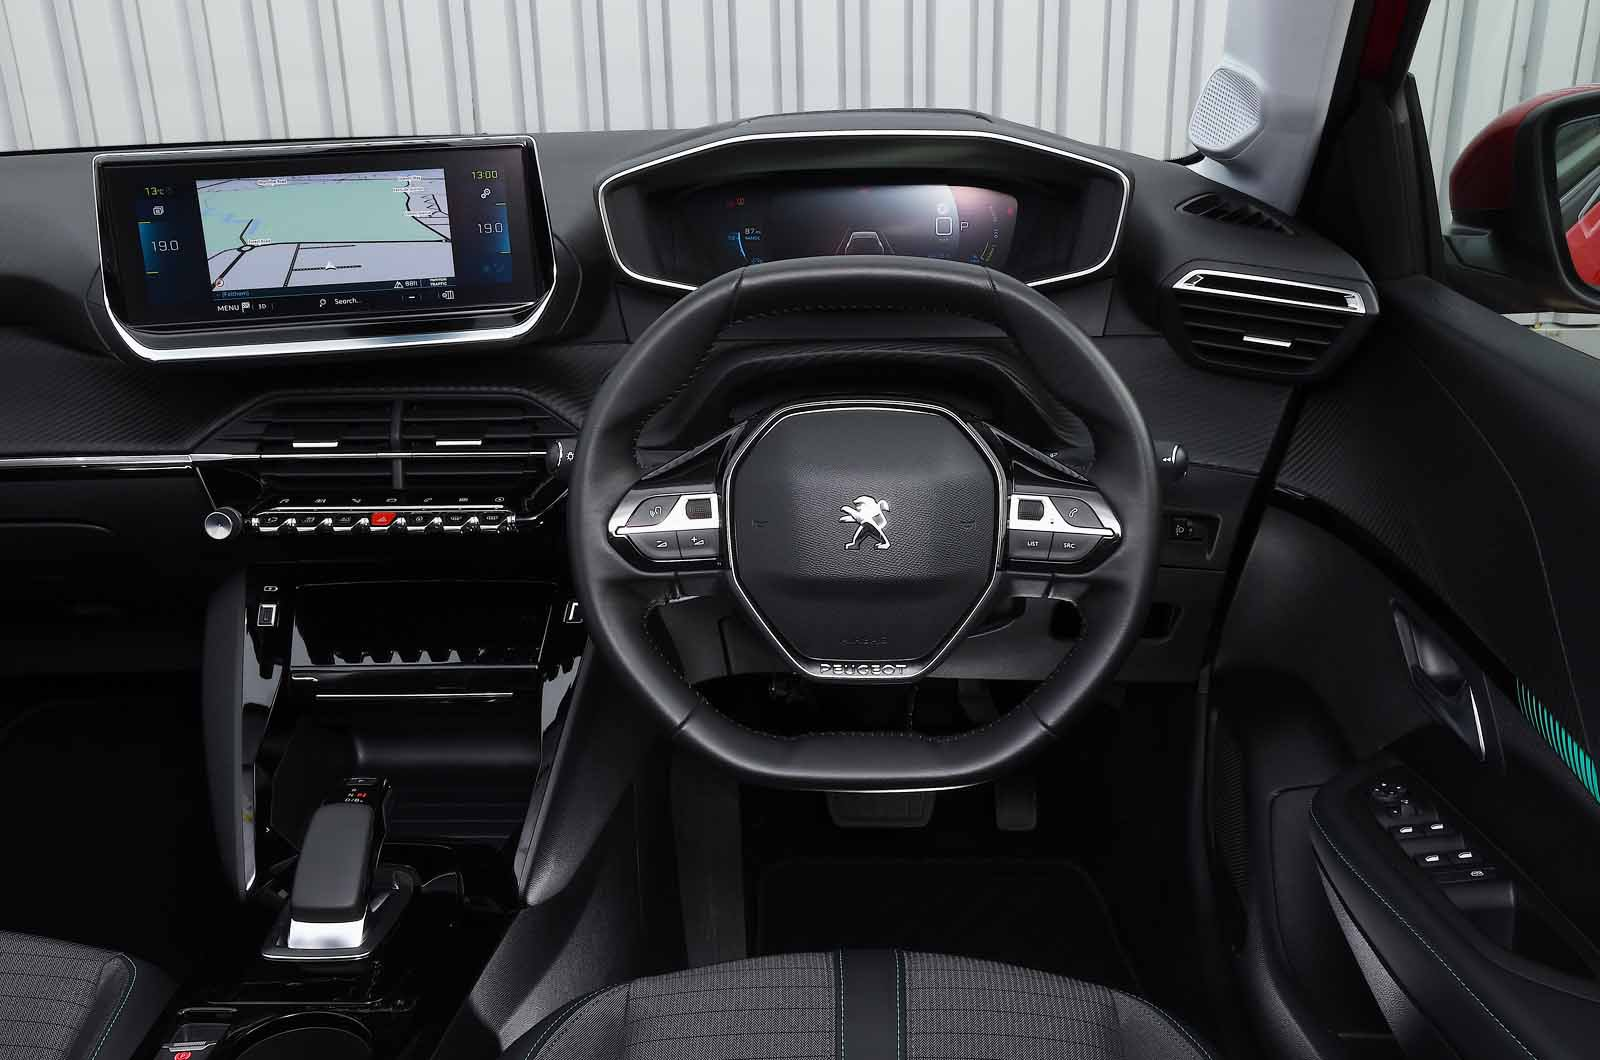 Peugeot e-208 2021 dashboard